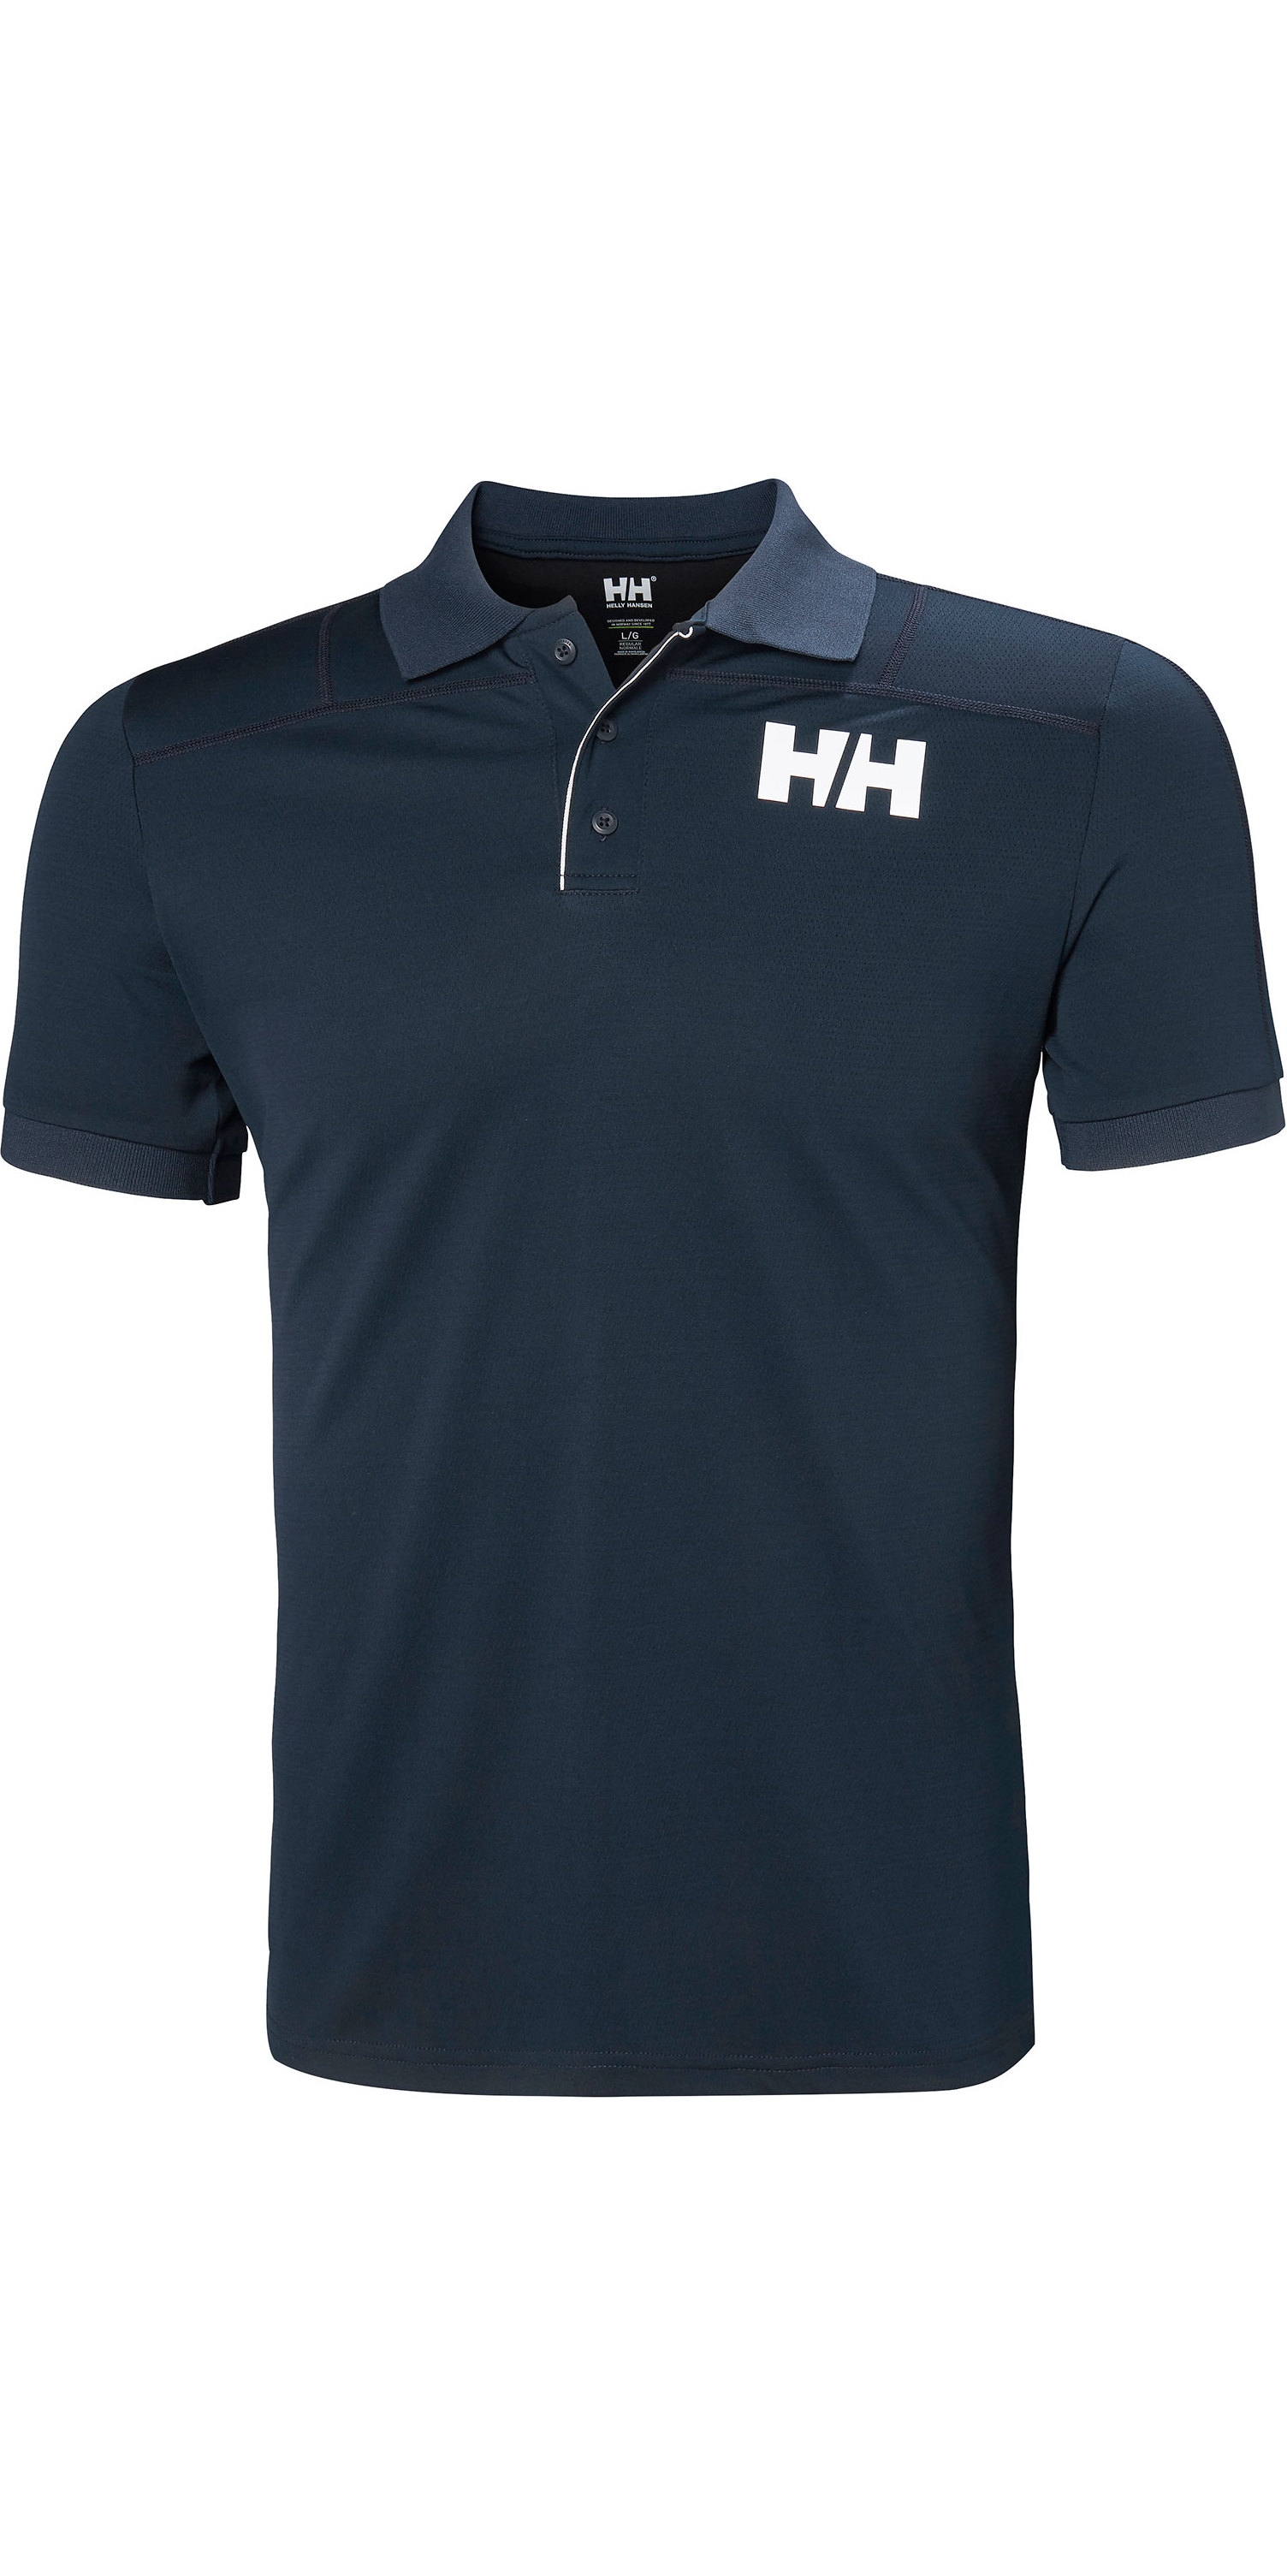 2019 Helly Hansen Mænds Lifa Active Polo Navy 49322 Med Kort ærme